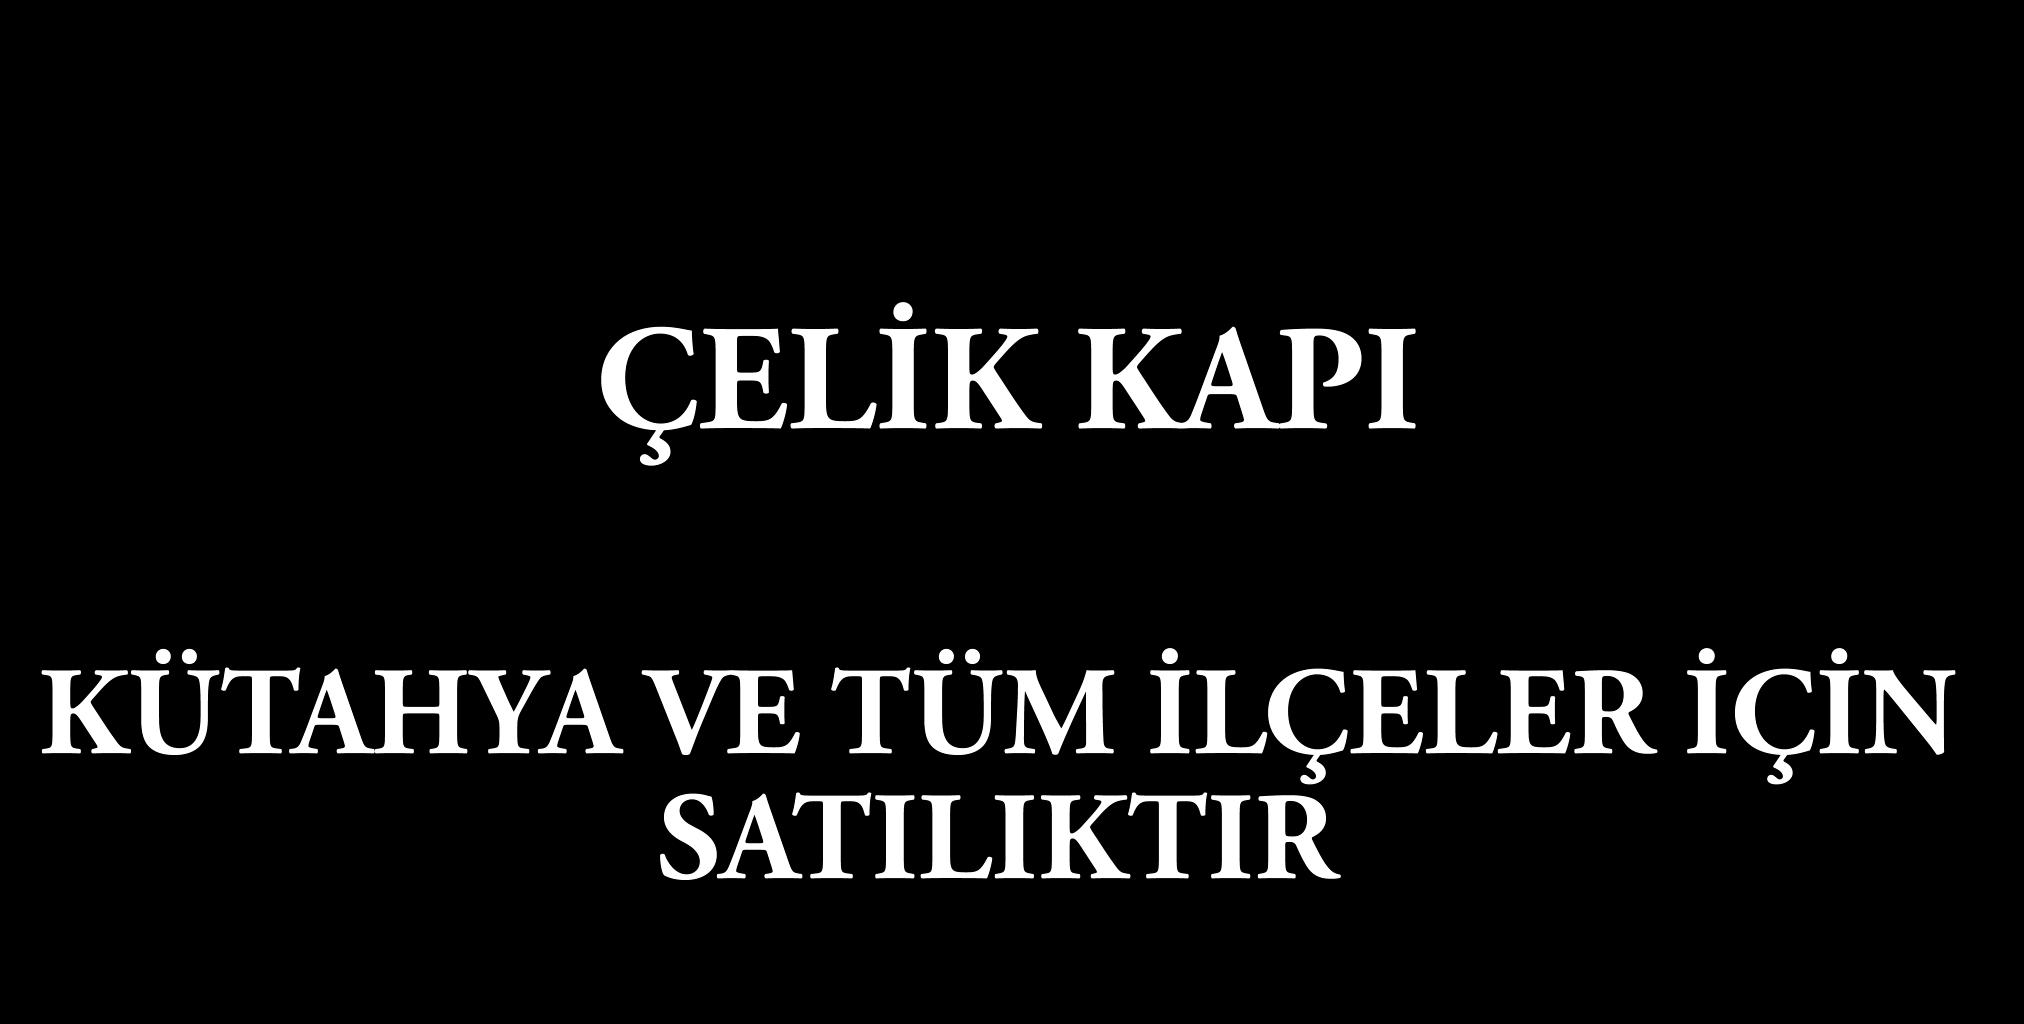 ÇELİK KAPI